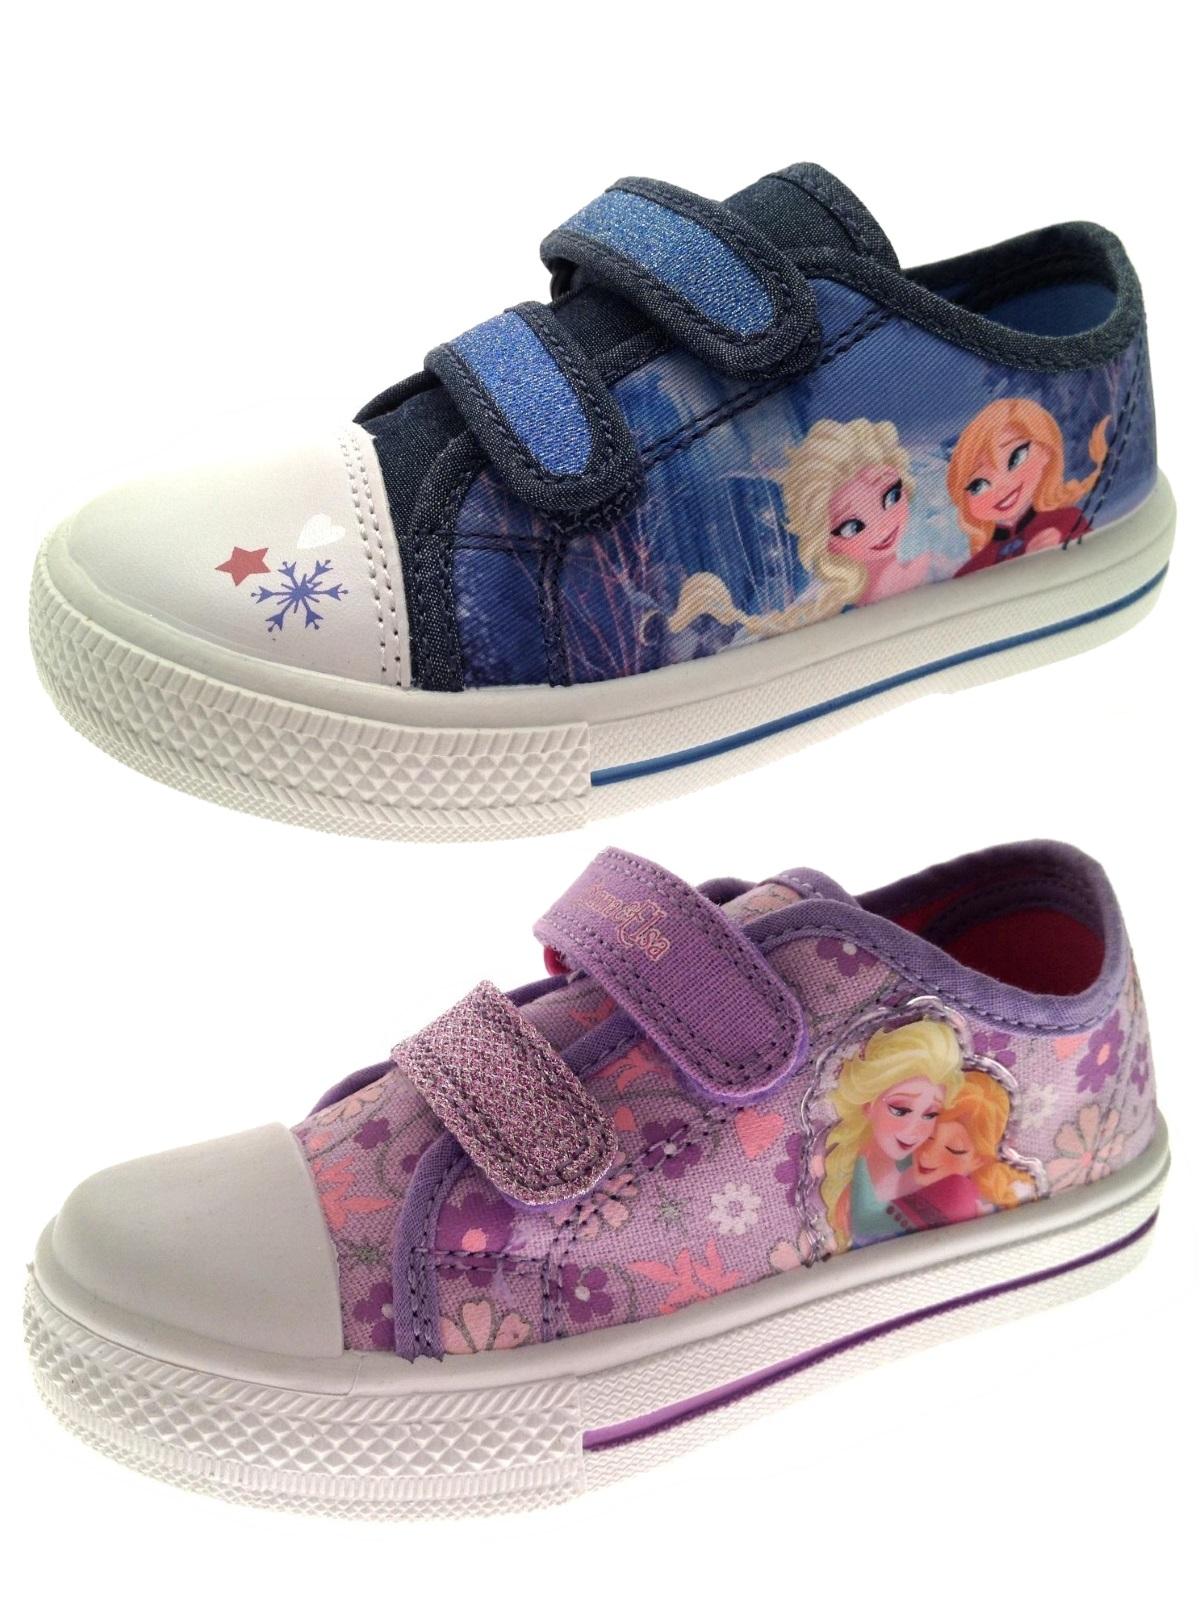 Girls Frozen Anna Elsa Plimsolls Skate Pumps Trainers Kids Character Shoes Size